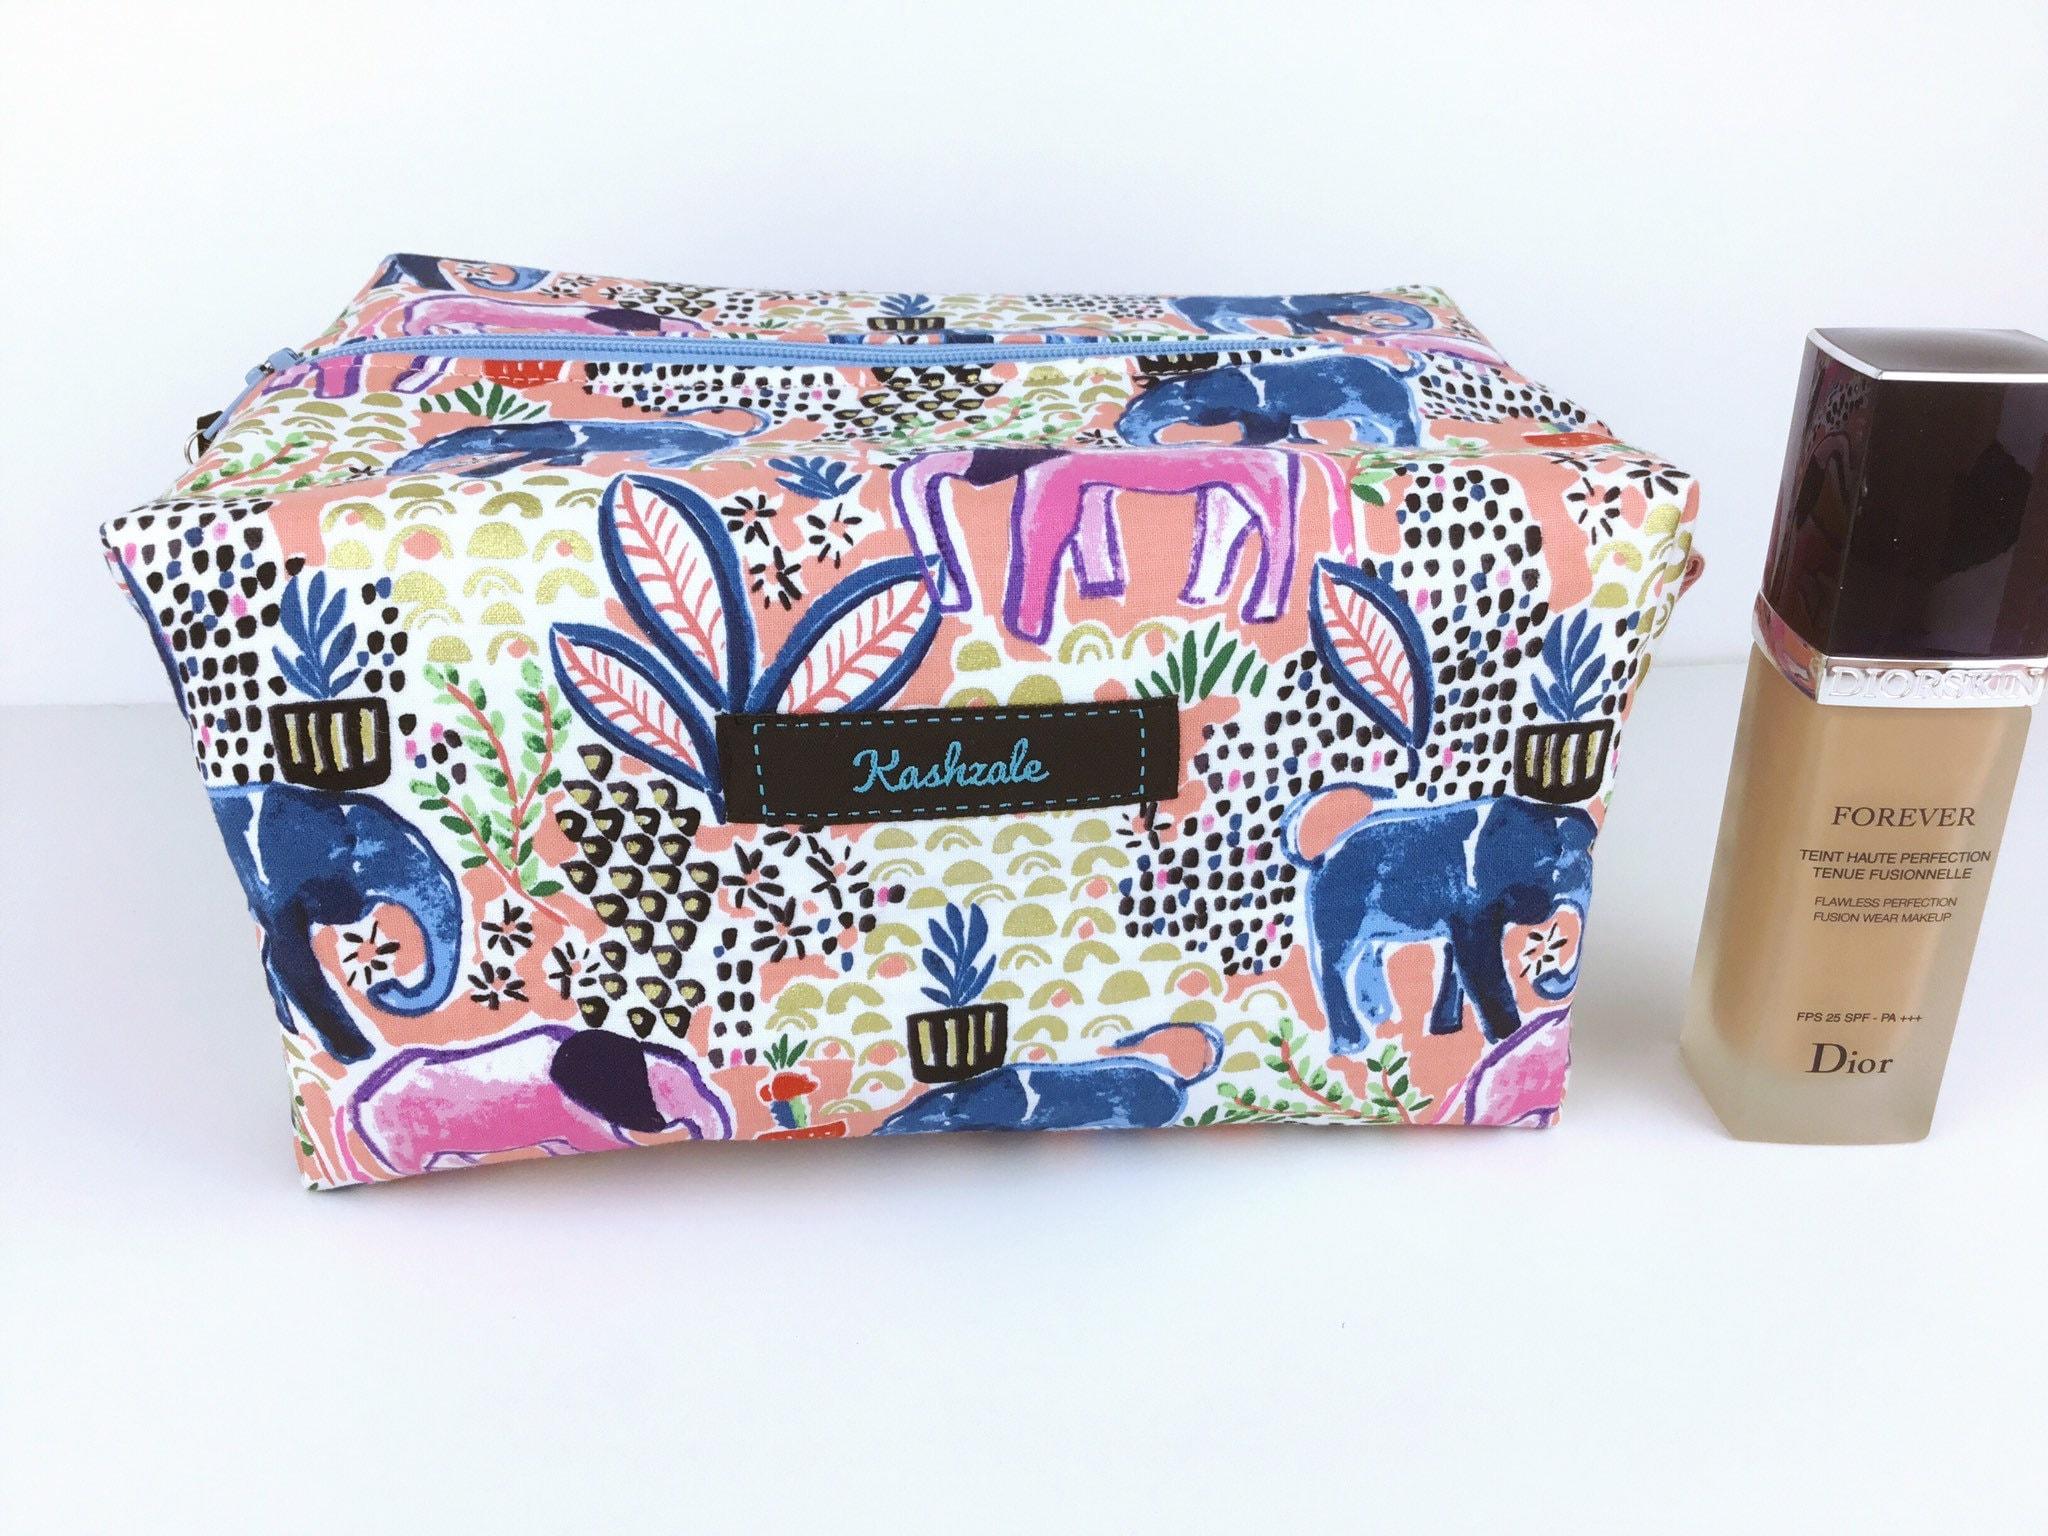 Elephant Print Large Cosmetic Bag, Make Up Bag, Toiletry Bag, Travel Bag, Large Box Shape Style, Made in Australia, Large Makeup Bag.